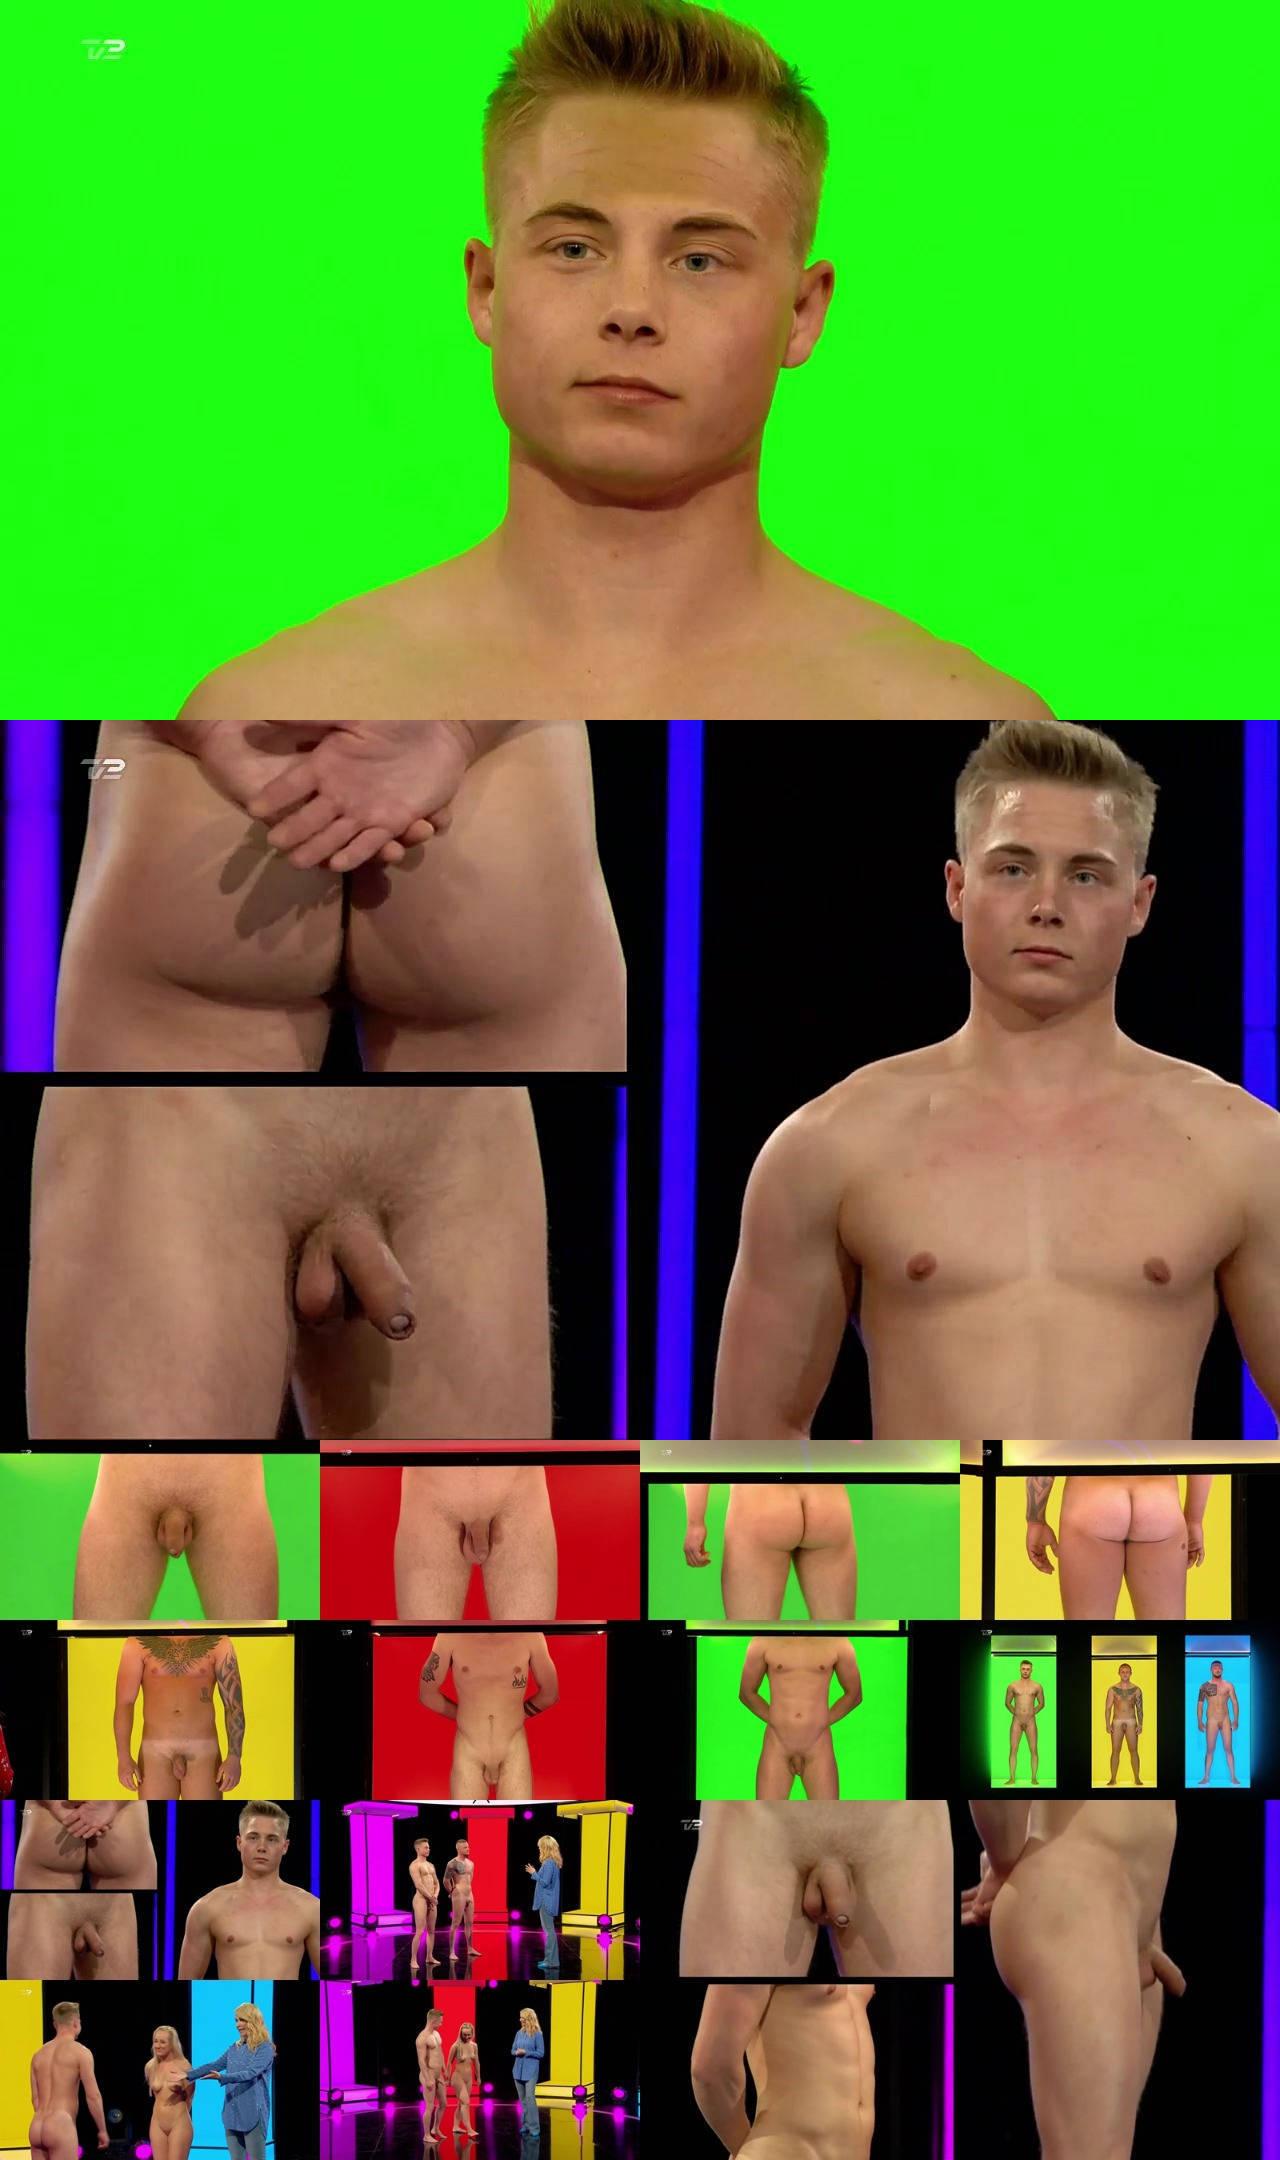 danish guys naked on tv dating show